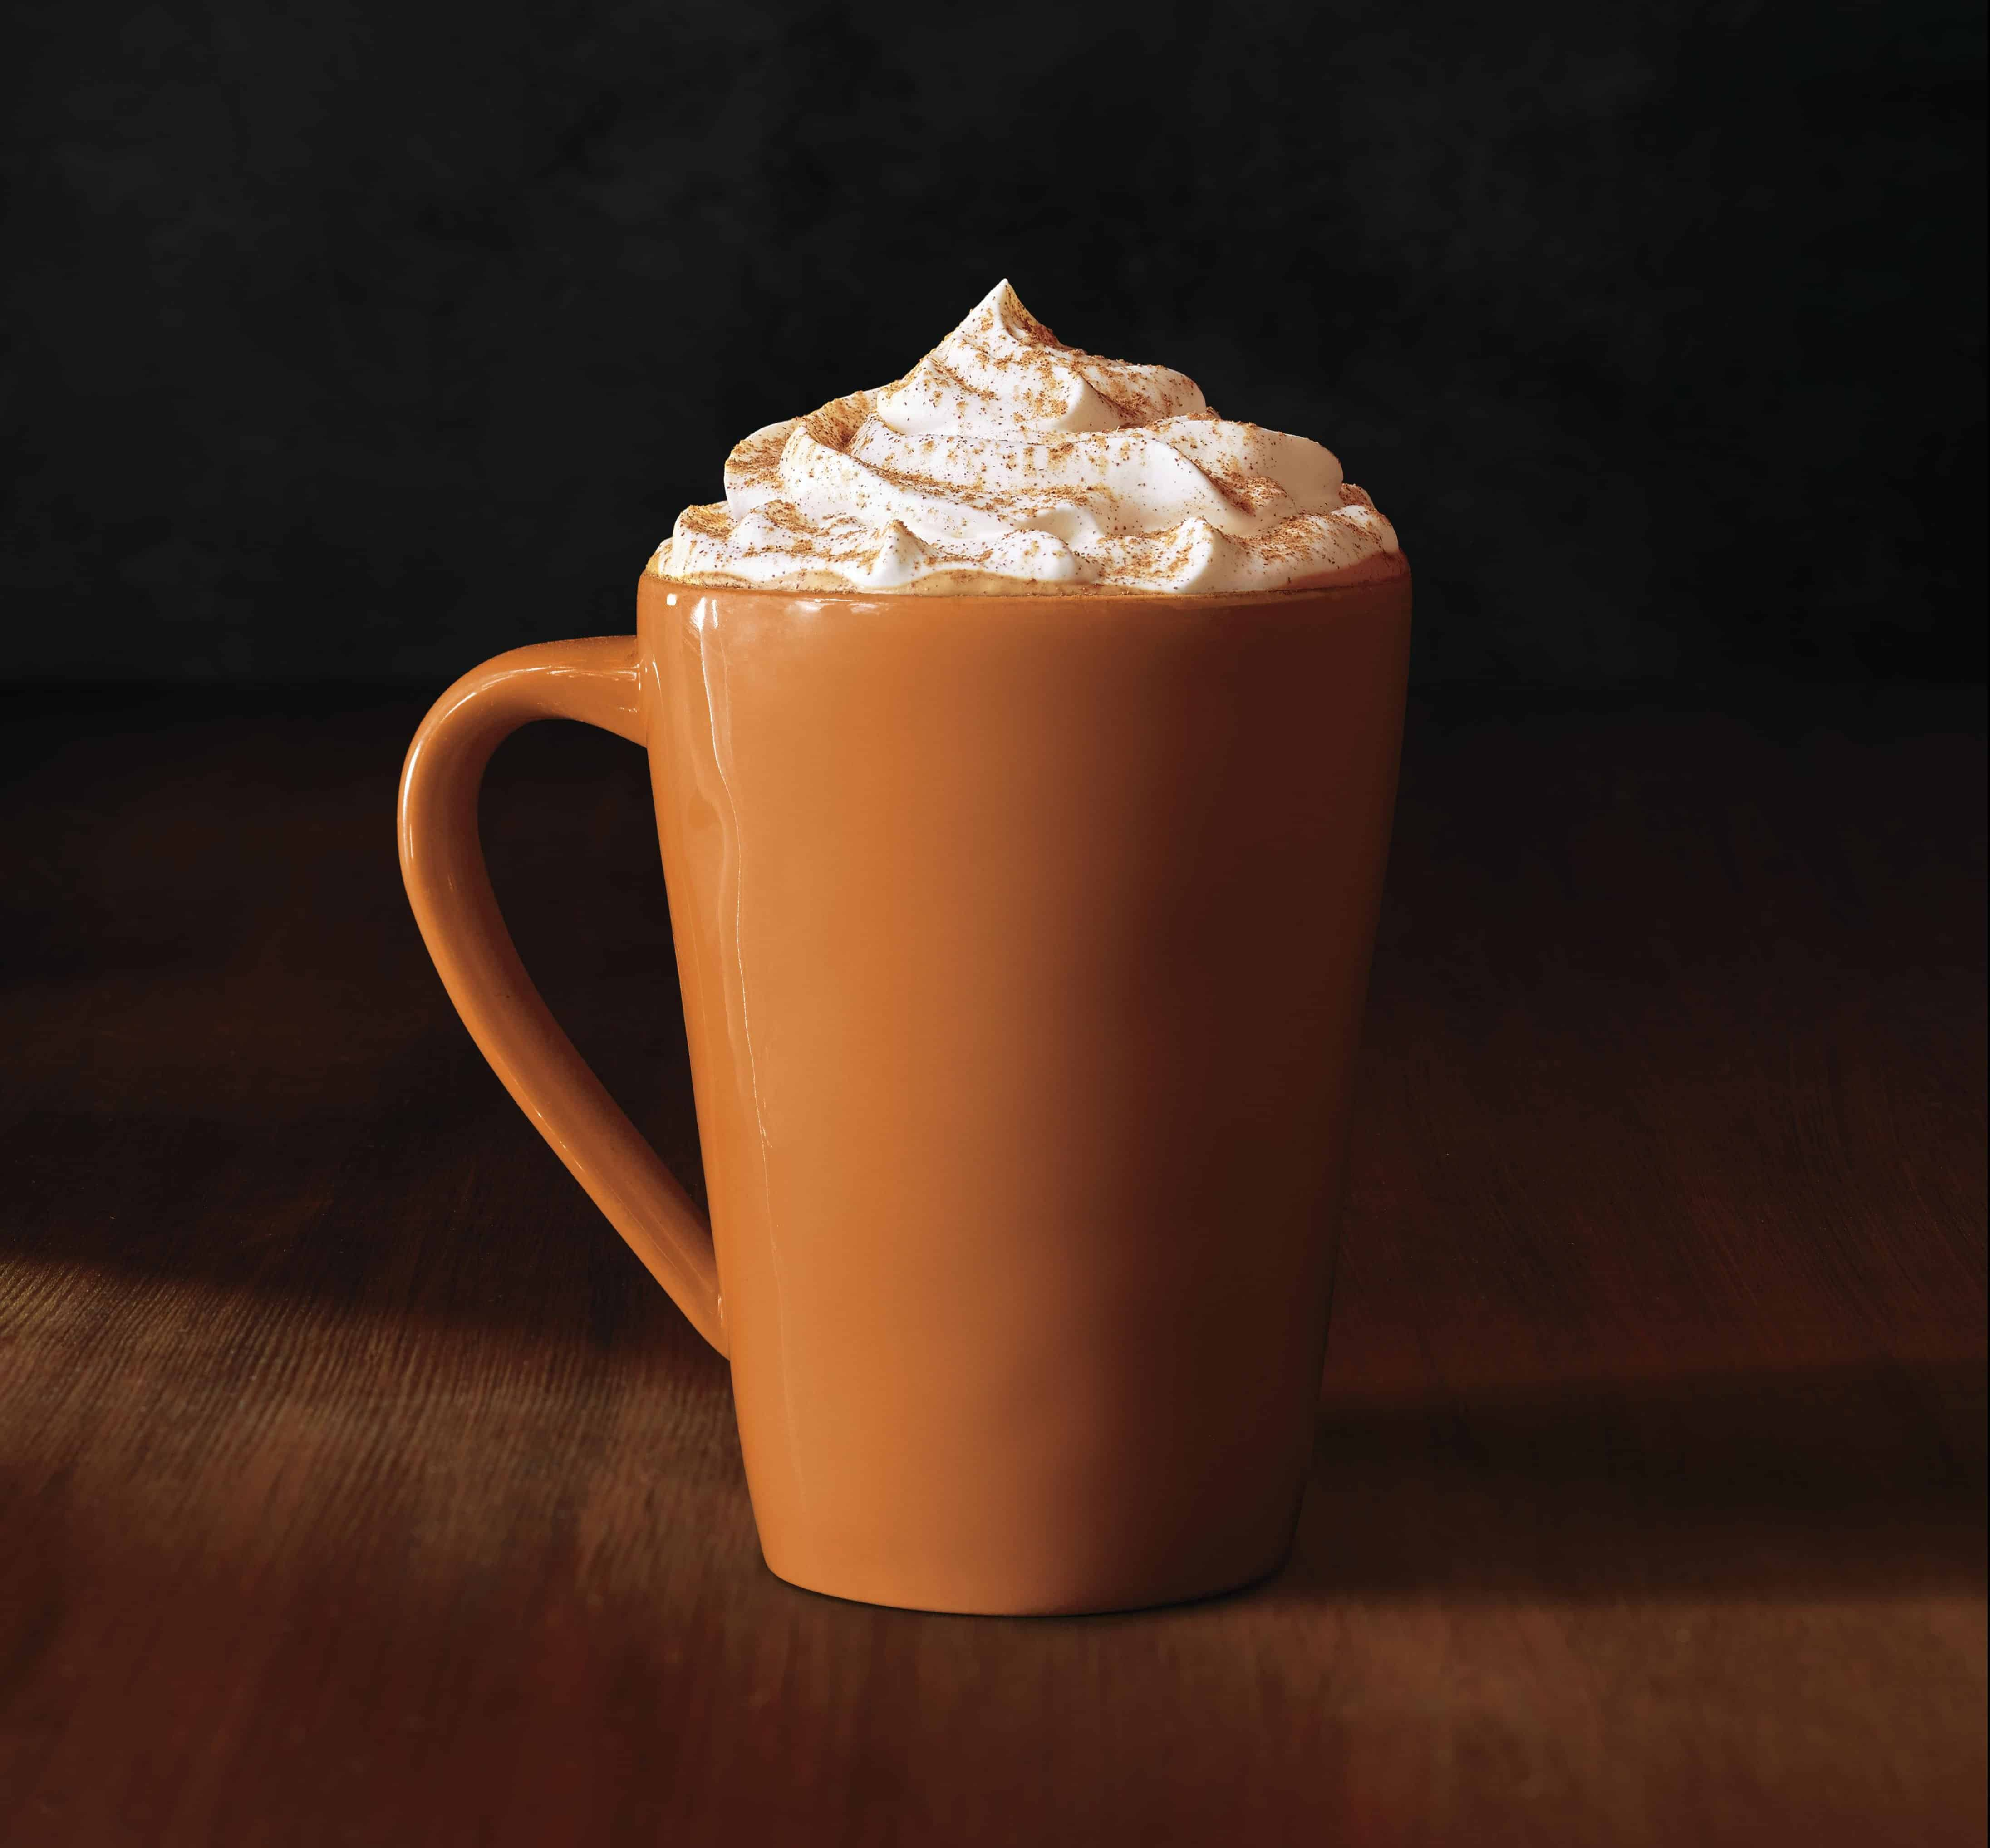 Is Starbucks Pumpkin Spice Latte Gluten Free?